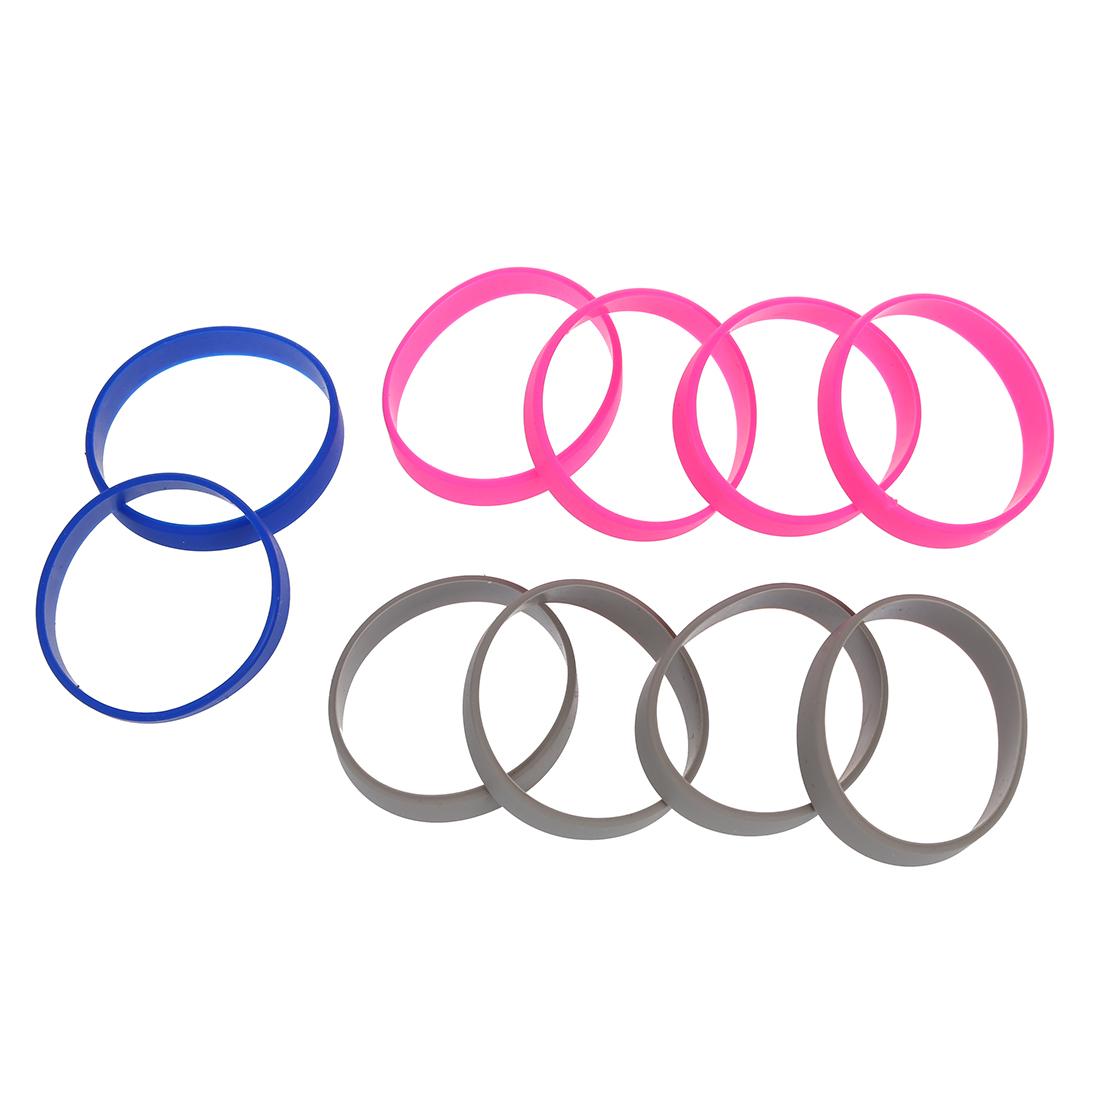 10 silikon gummi armband stulpe armband handgelenk band 12mm me ebay. Black Bedroom Furniture Sets. Home Design Ideas